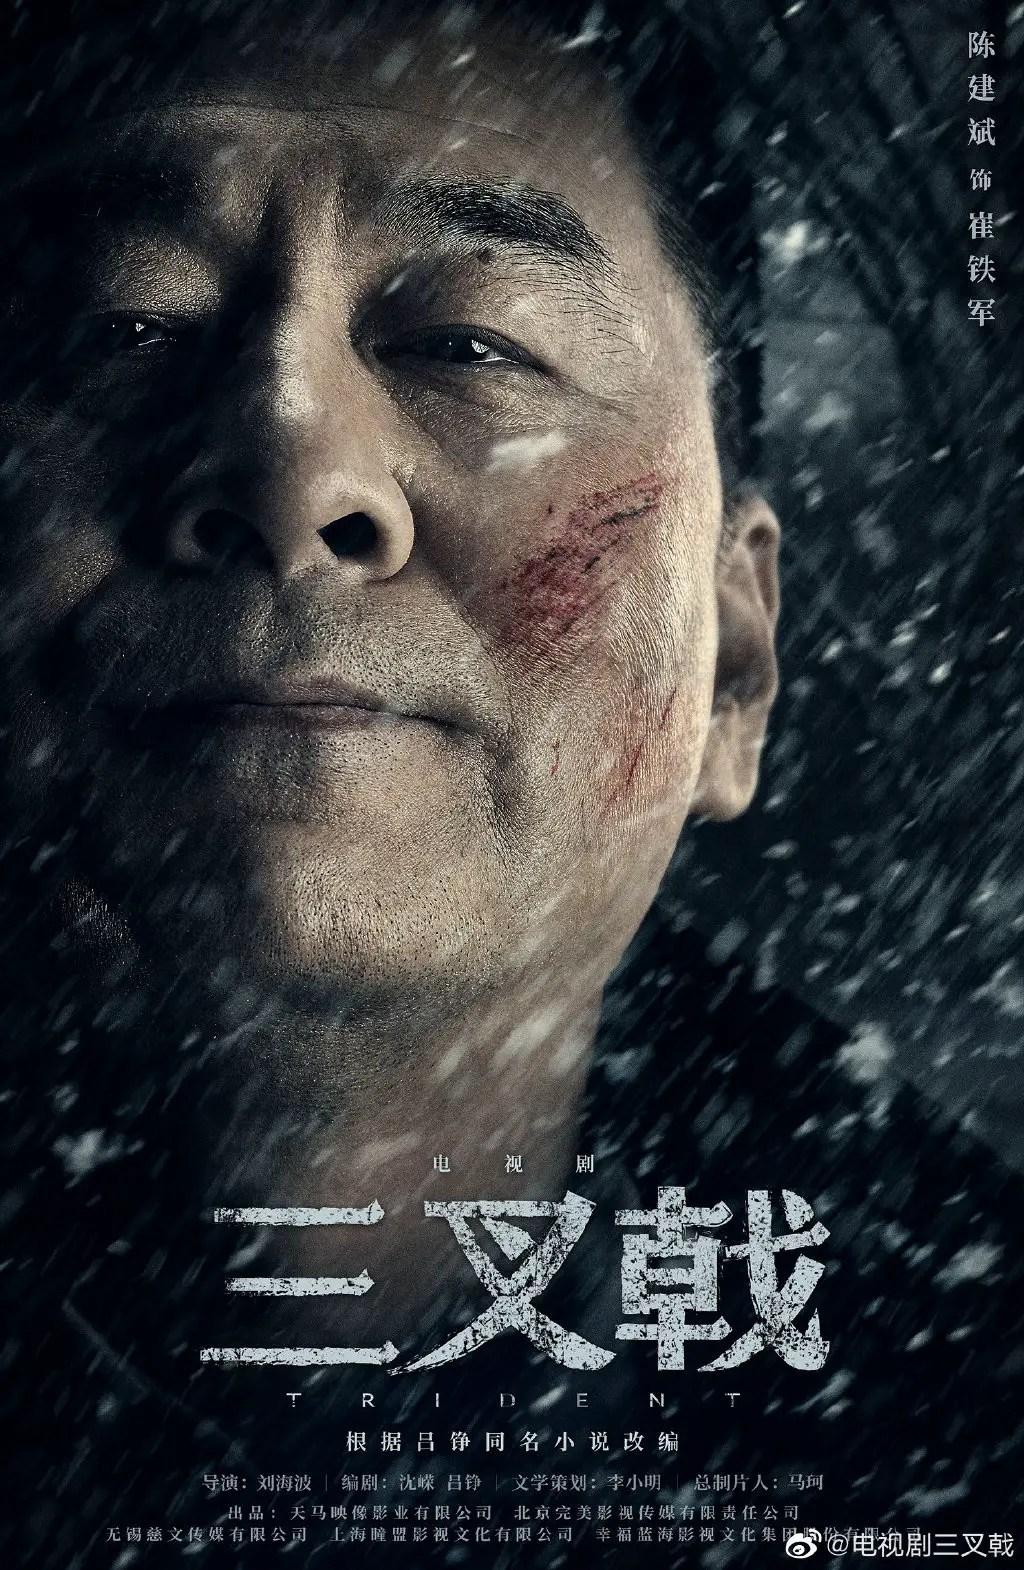 Chen Jian Bin